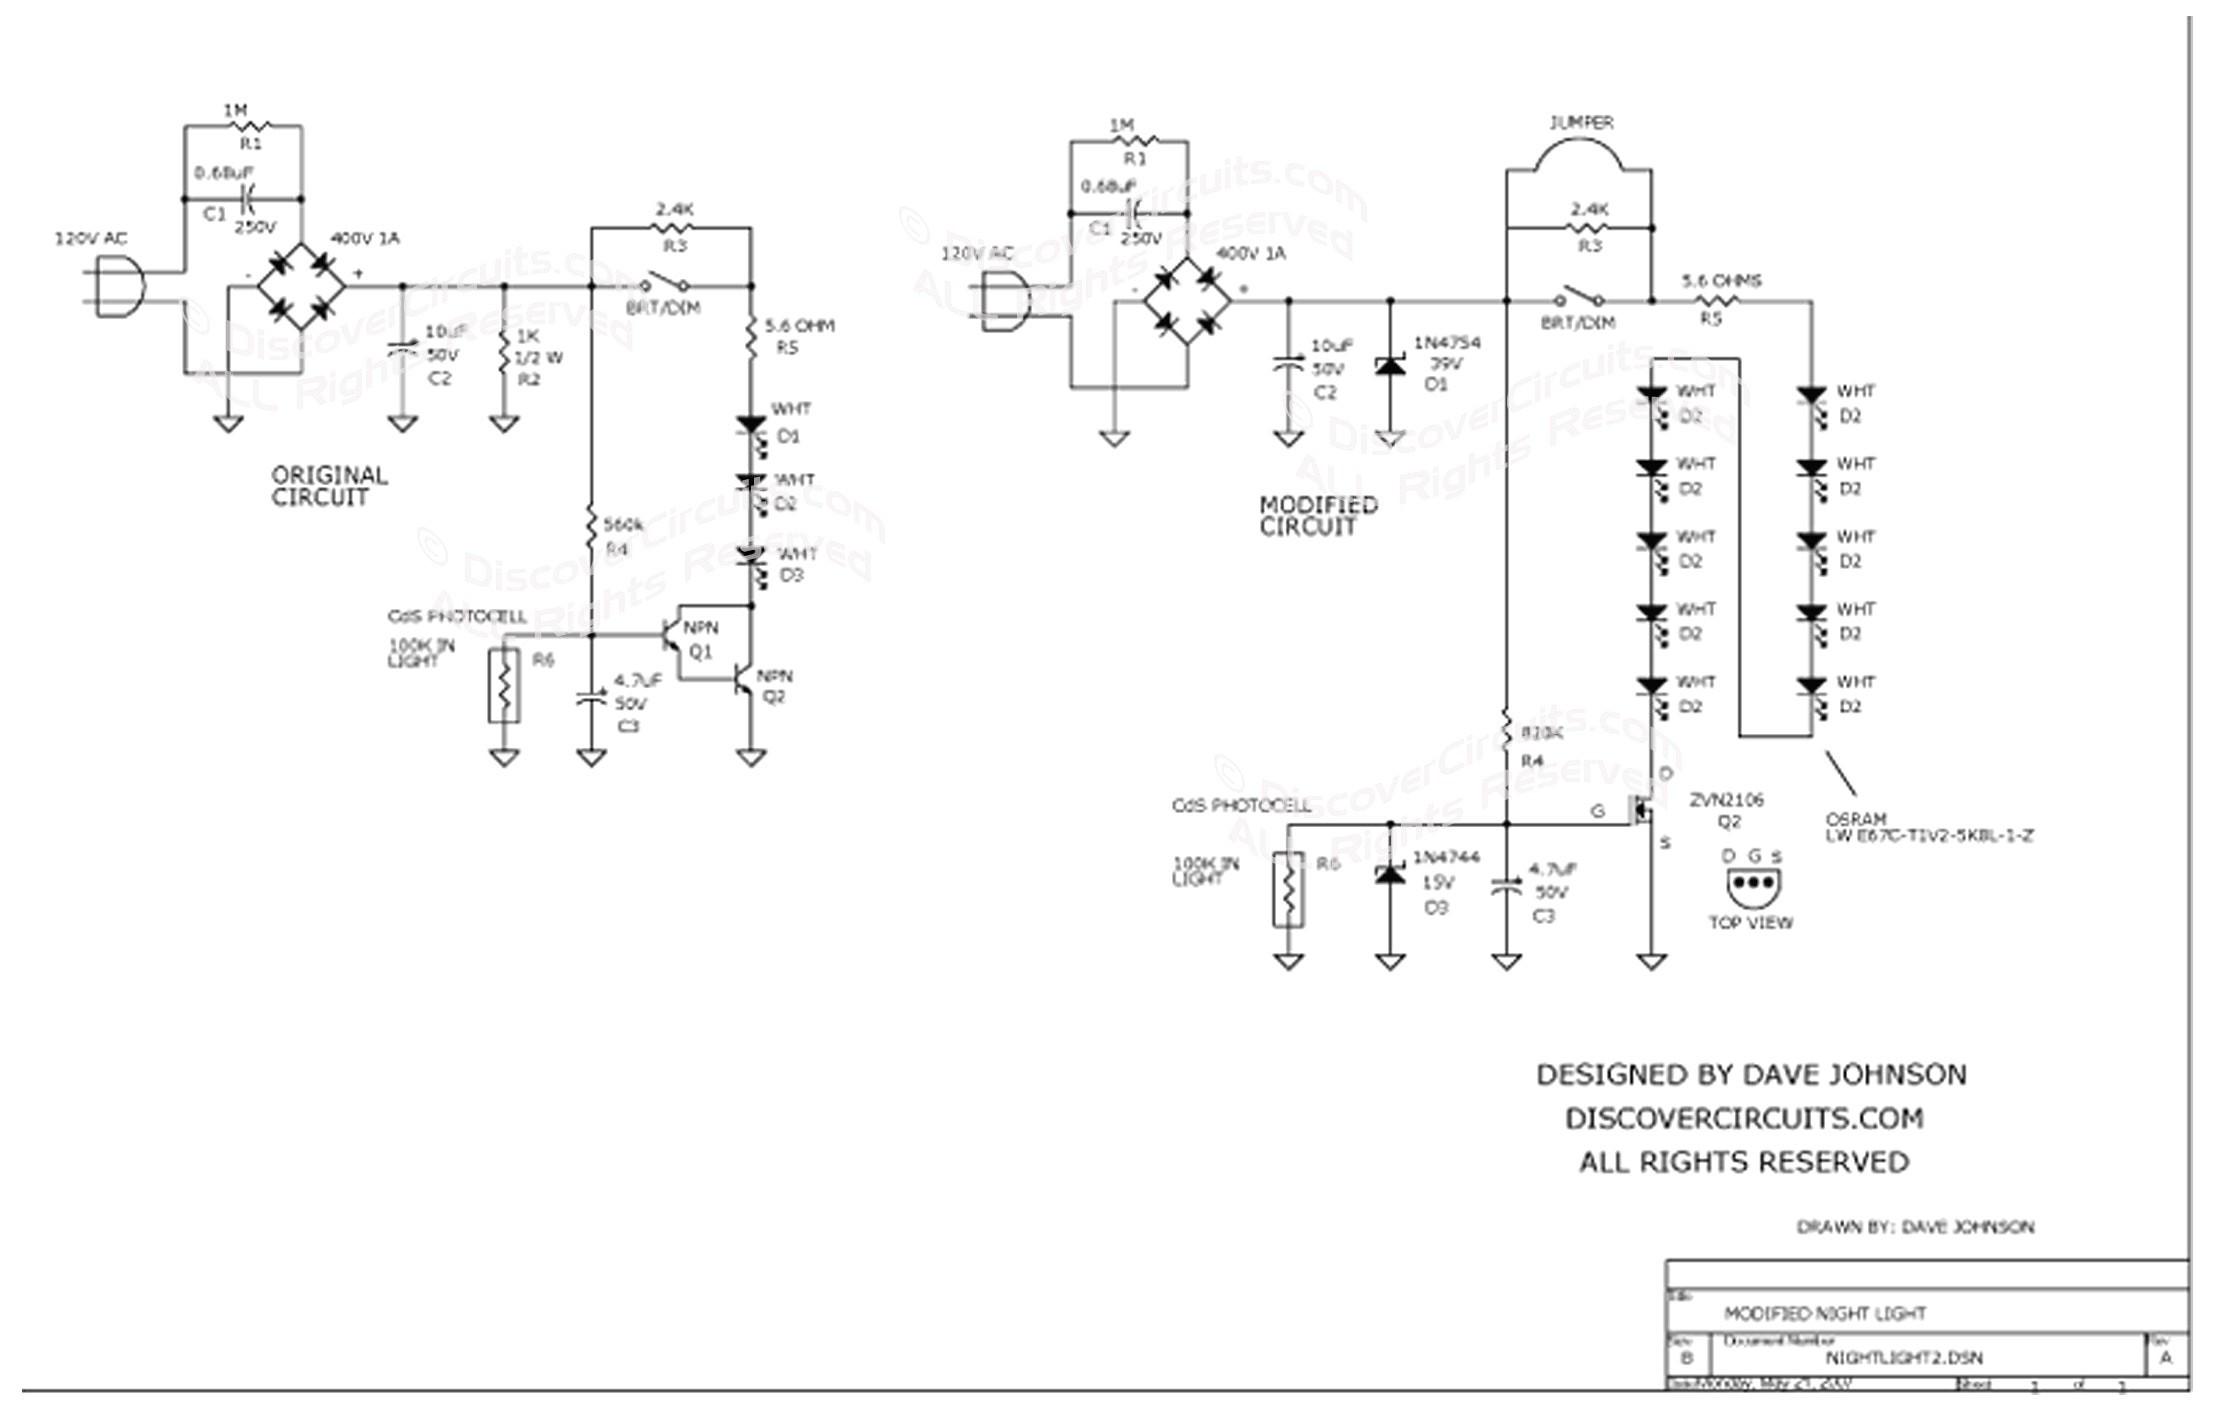 Zl 1985 0 10v Dimming Led Downlight Wiring Diagram Wiring Diagram